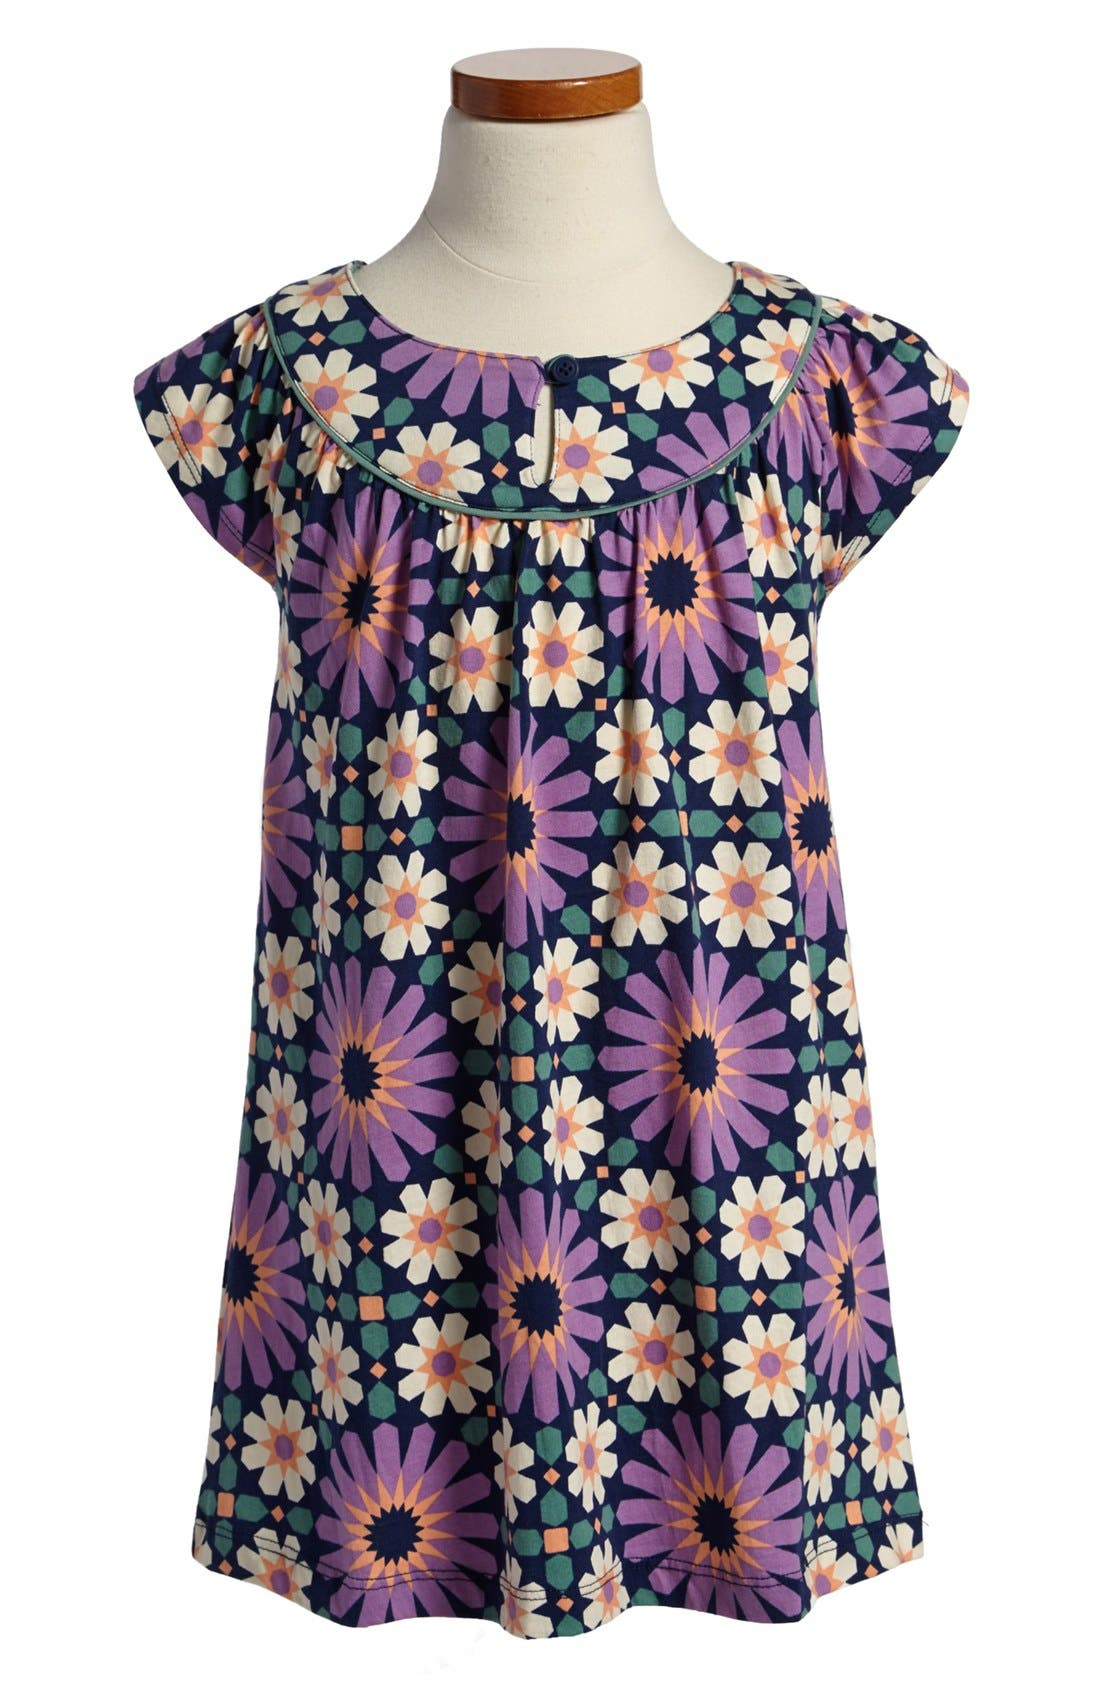 Alternate Image 1 Selected - Tea Collection 'Fes' Tile Print Dress (Little Girls & Big Girls)